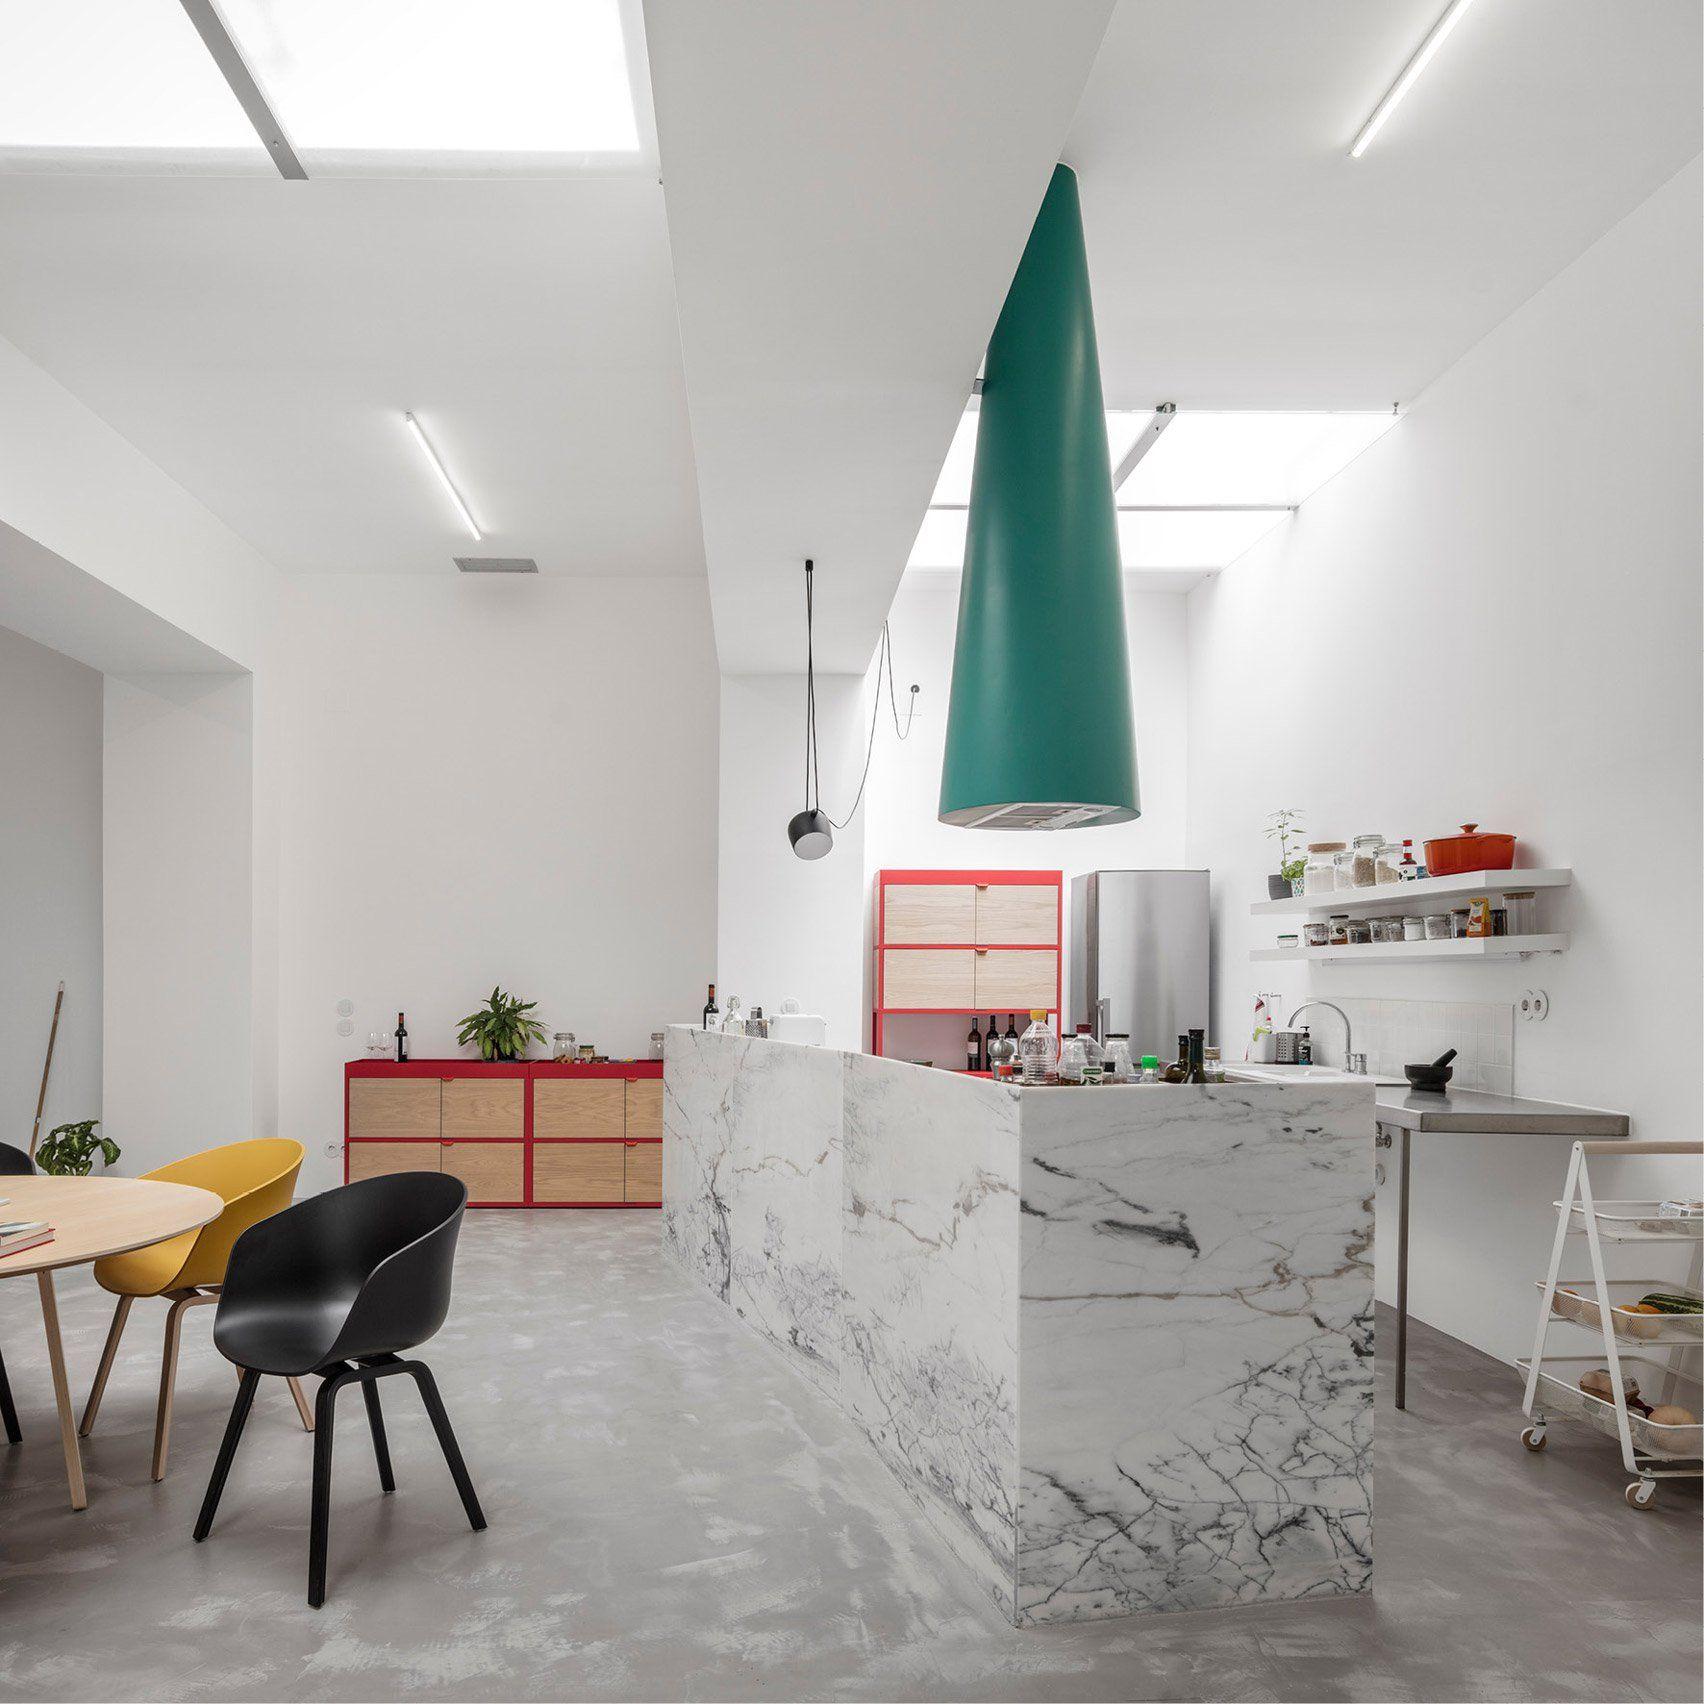 Fala Atelier has transformed a windowless garage in Lisbon into an ...